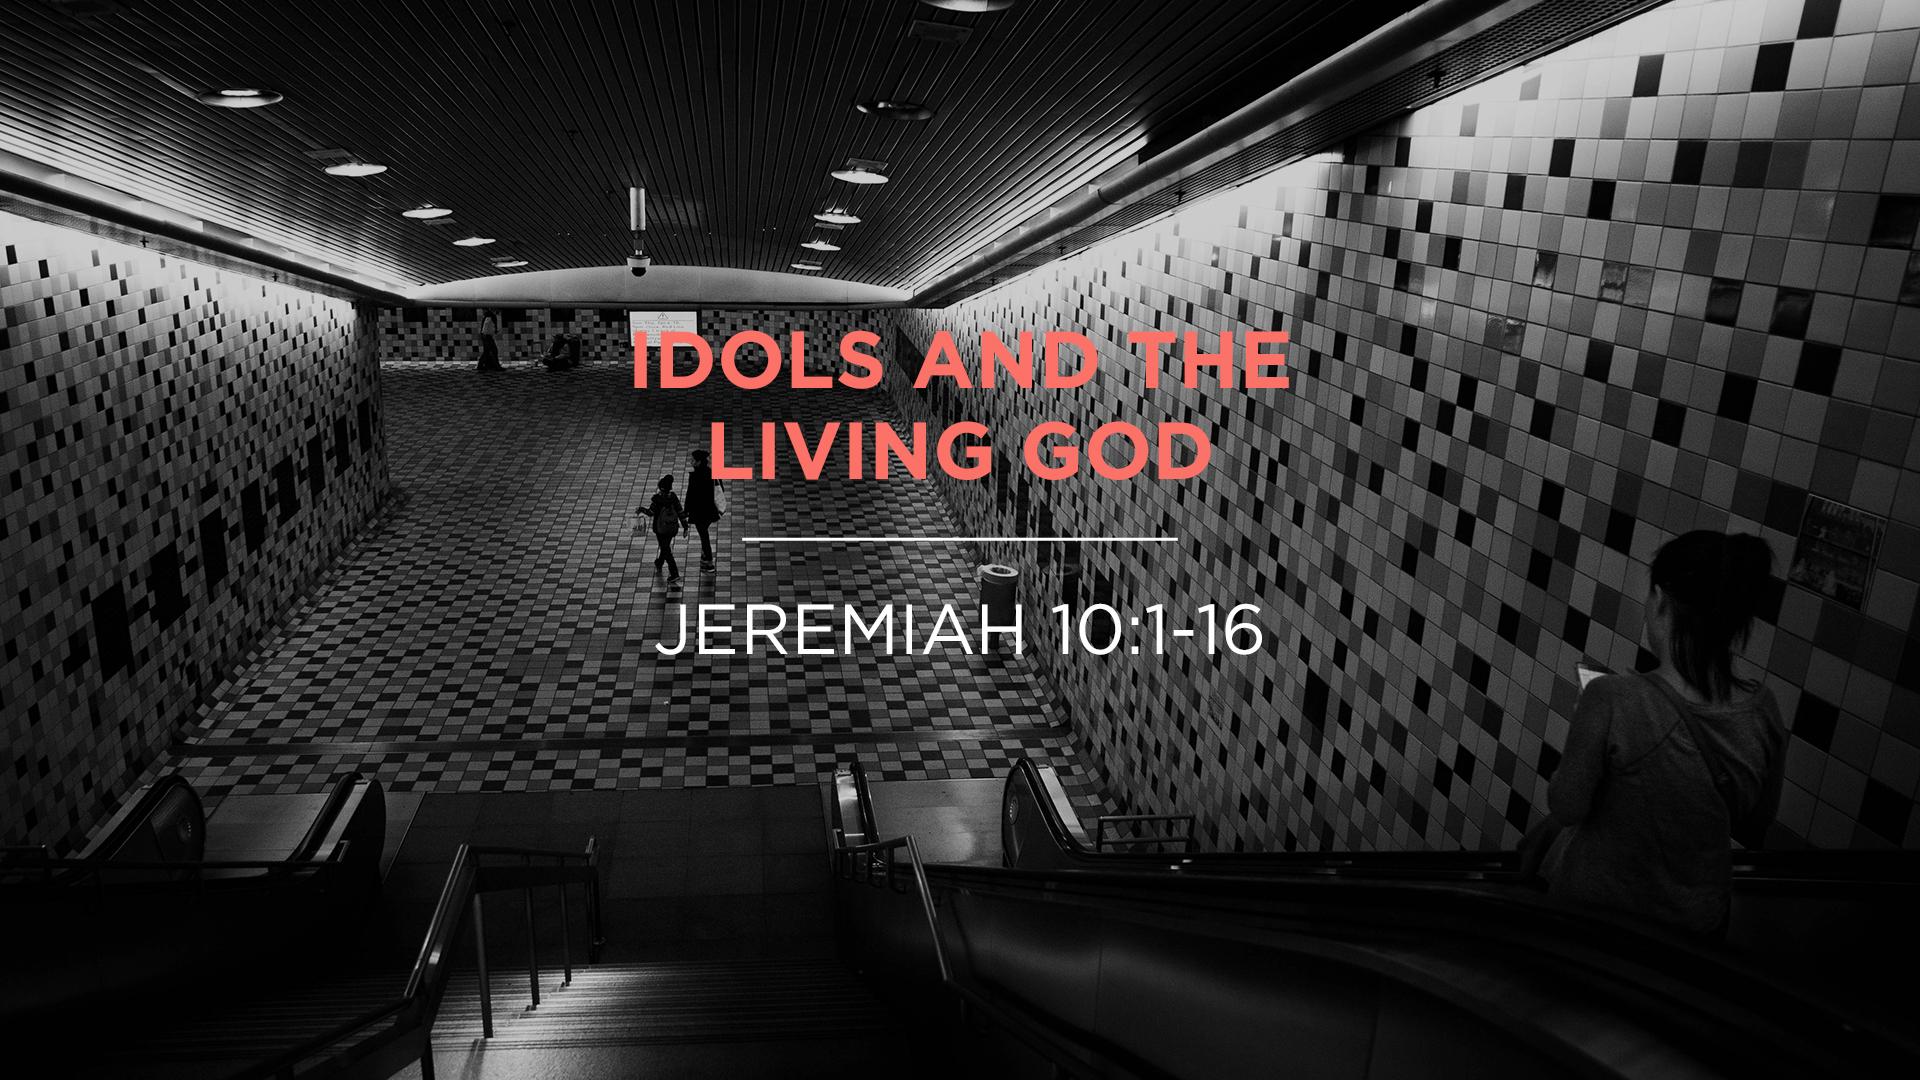 Idols and the Living God